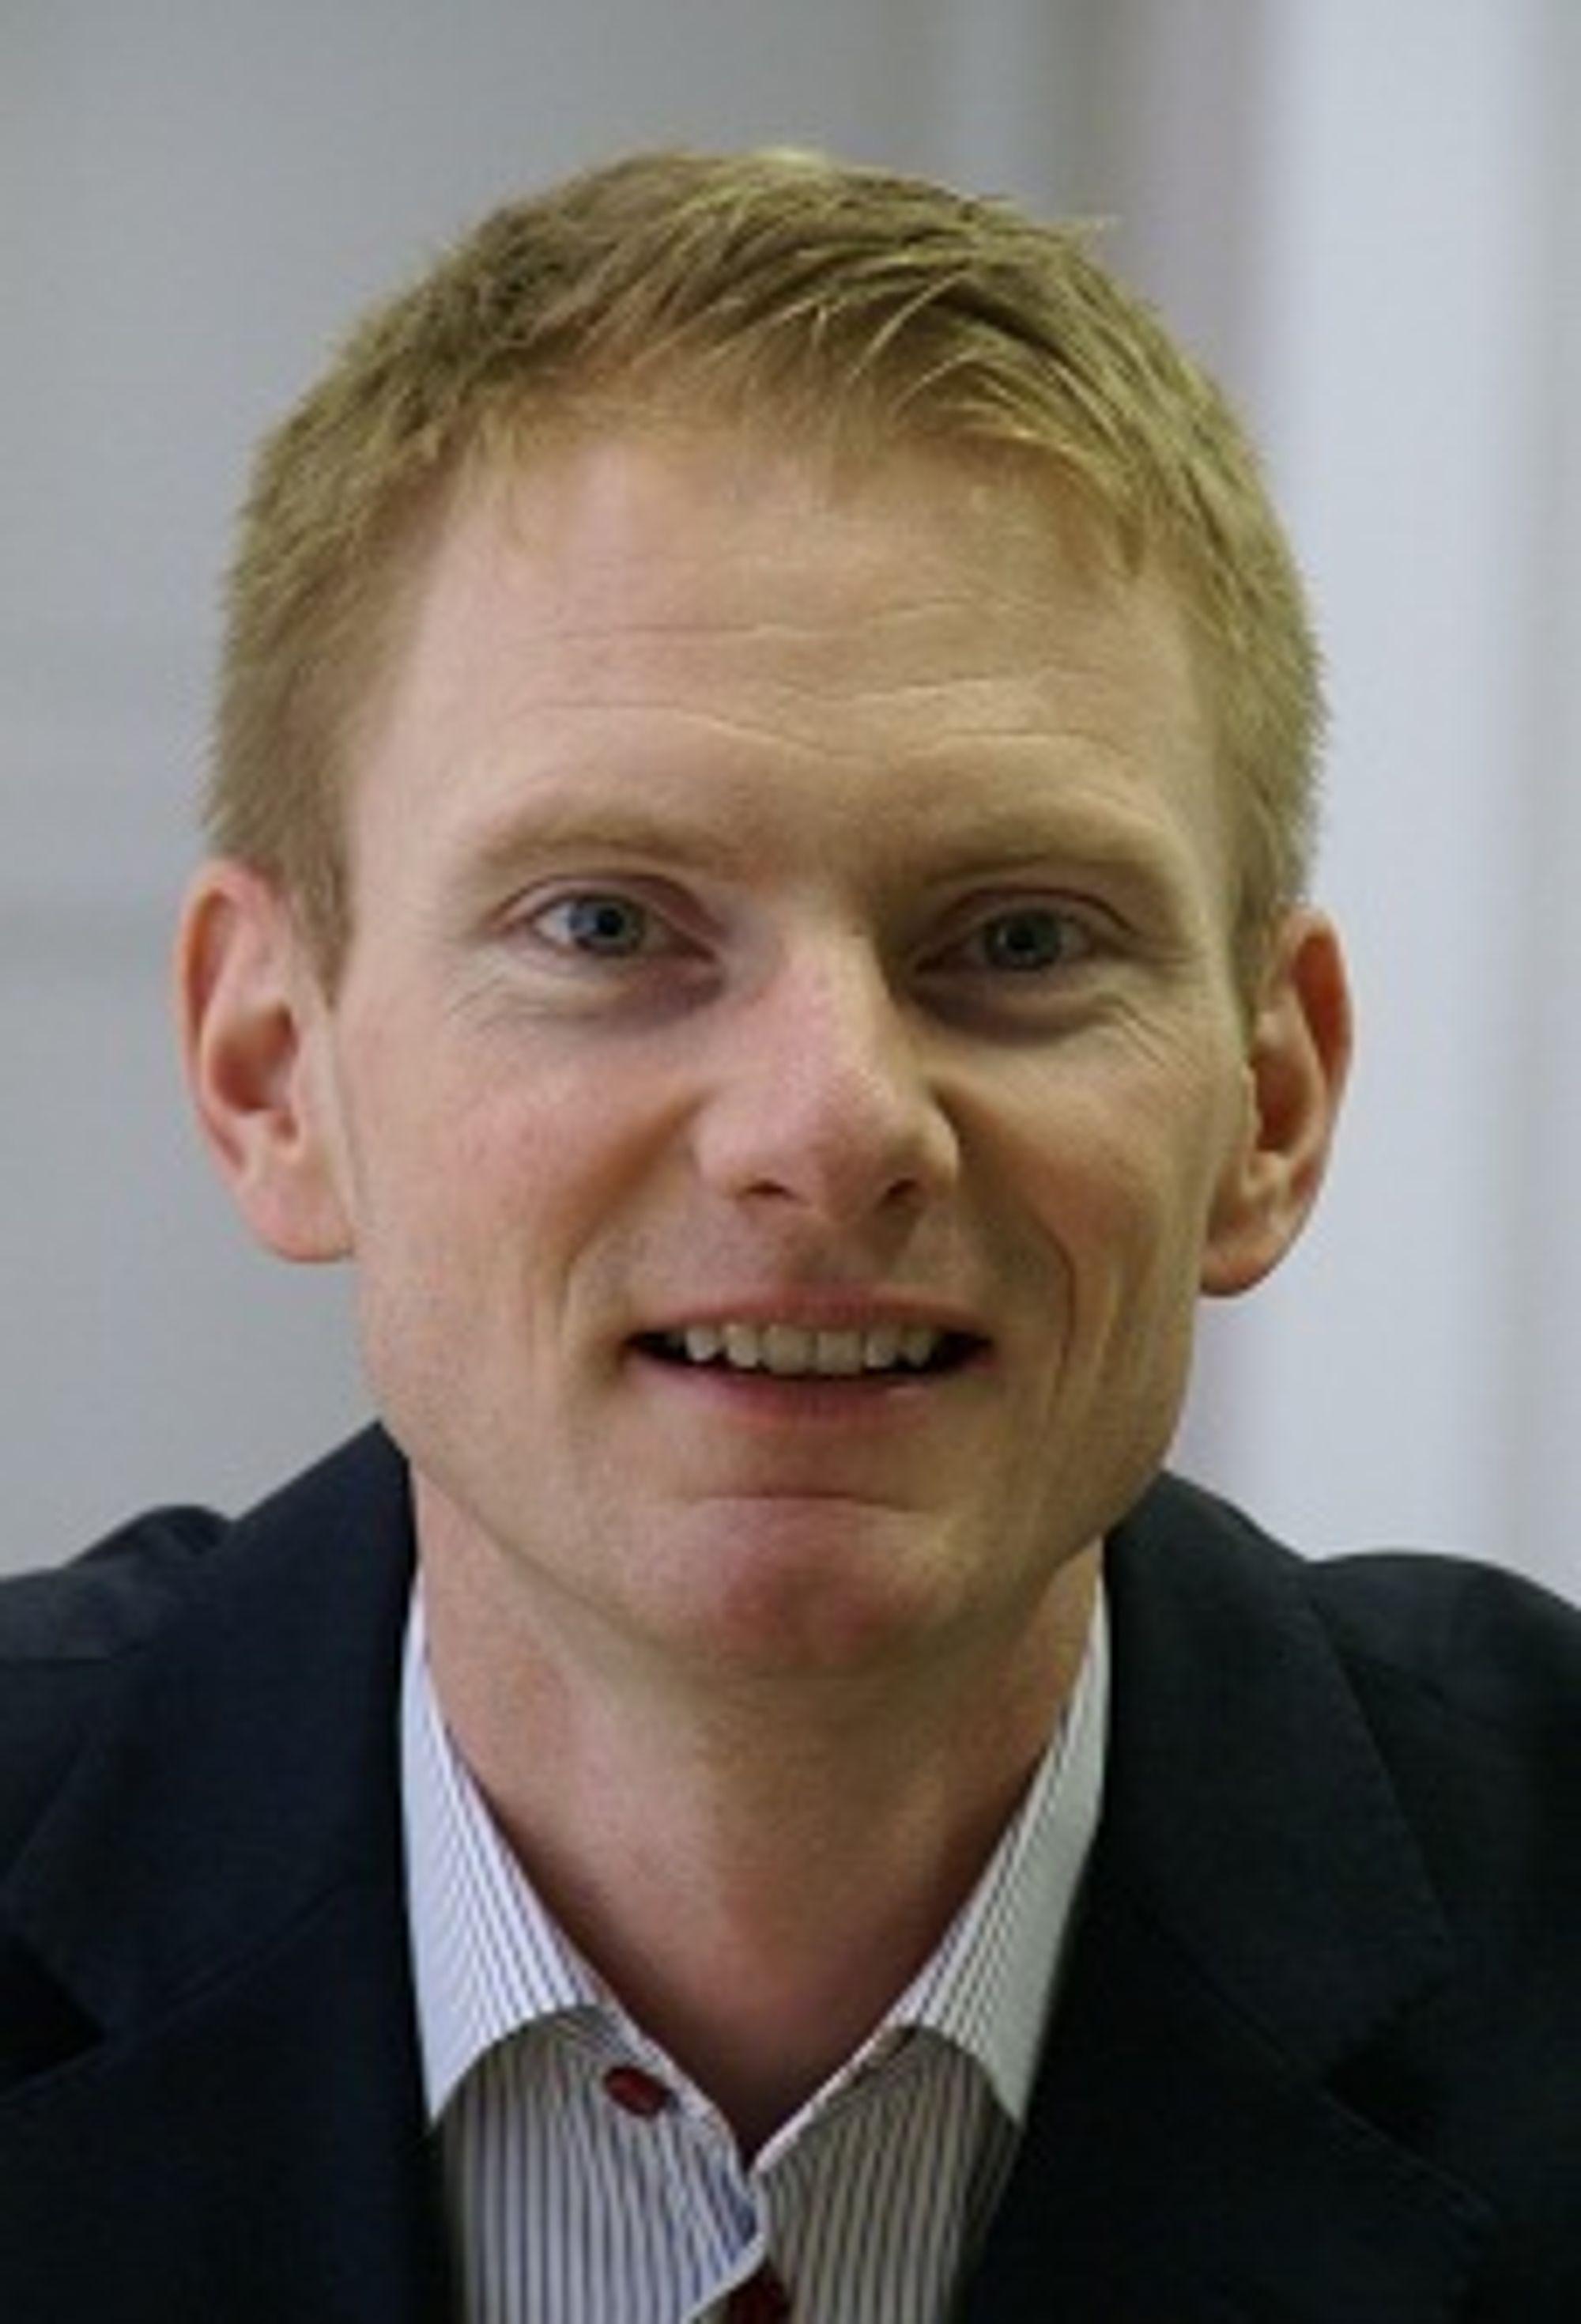 Fredrik Høst, daglig leder i EPSI Norge, mener at god kundeservice kan bidra til lojale kunder.